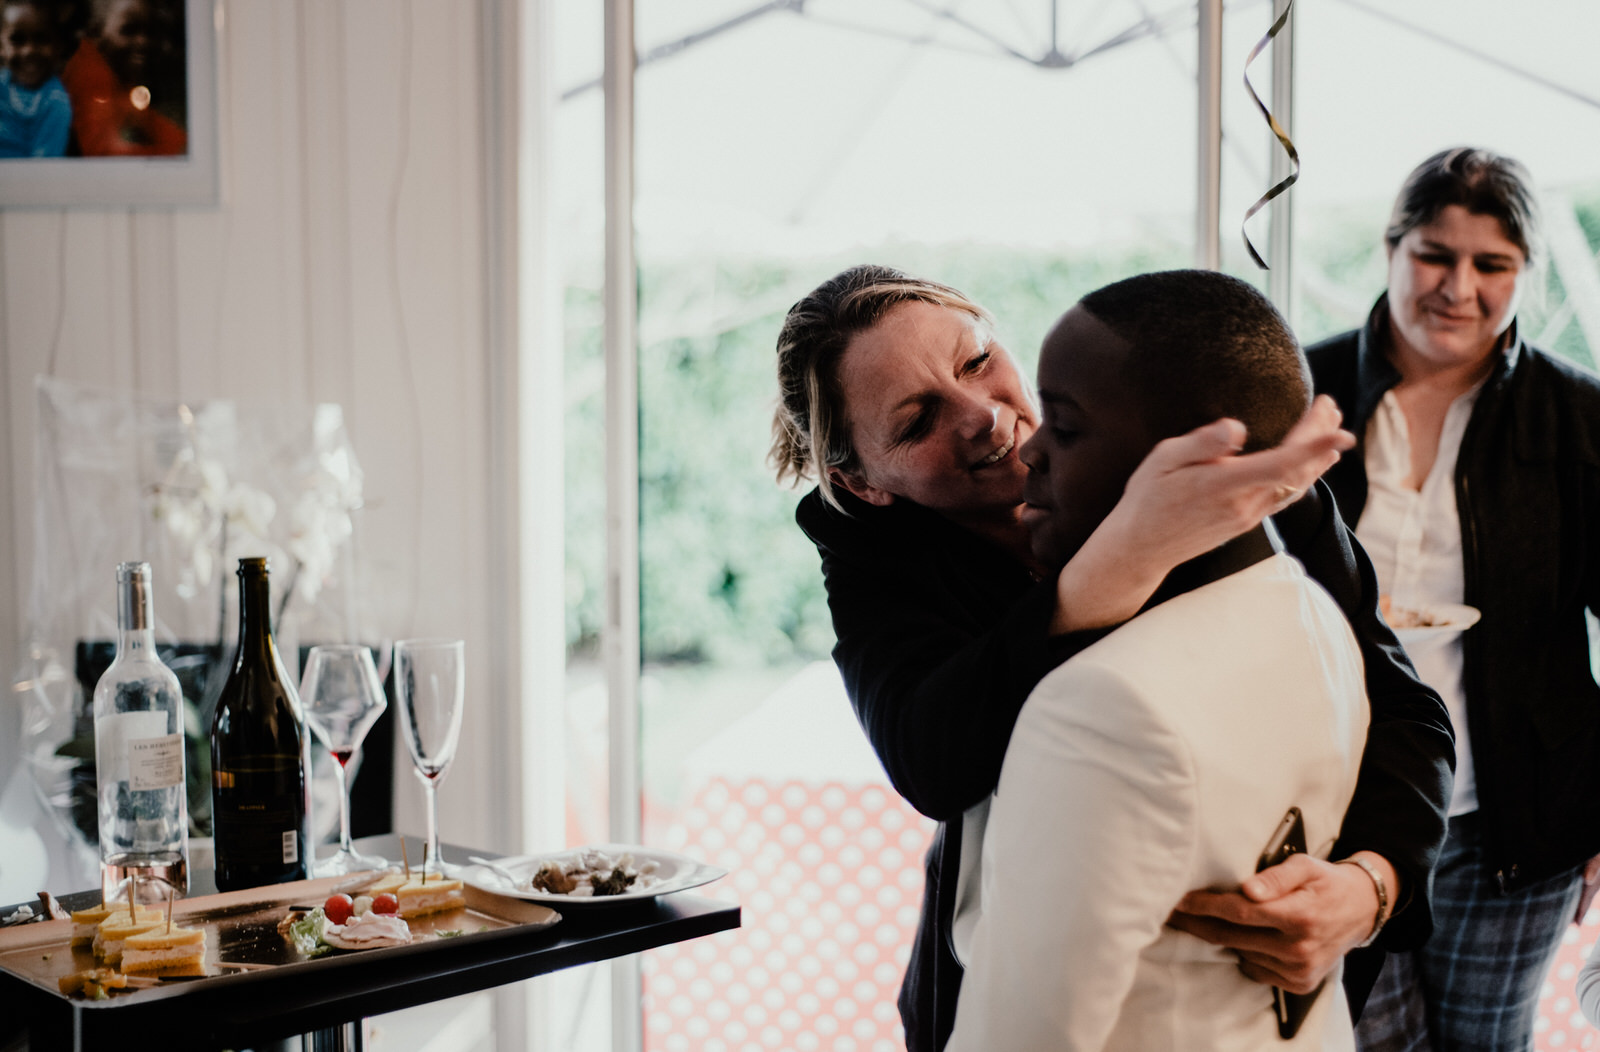 photographe mariage dordogne bapteme saint meard de gurcon